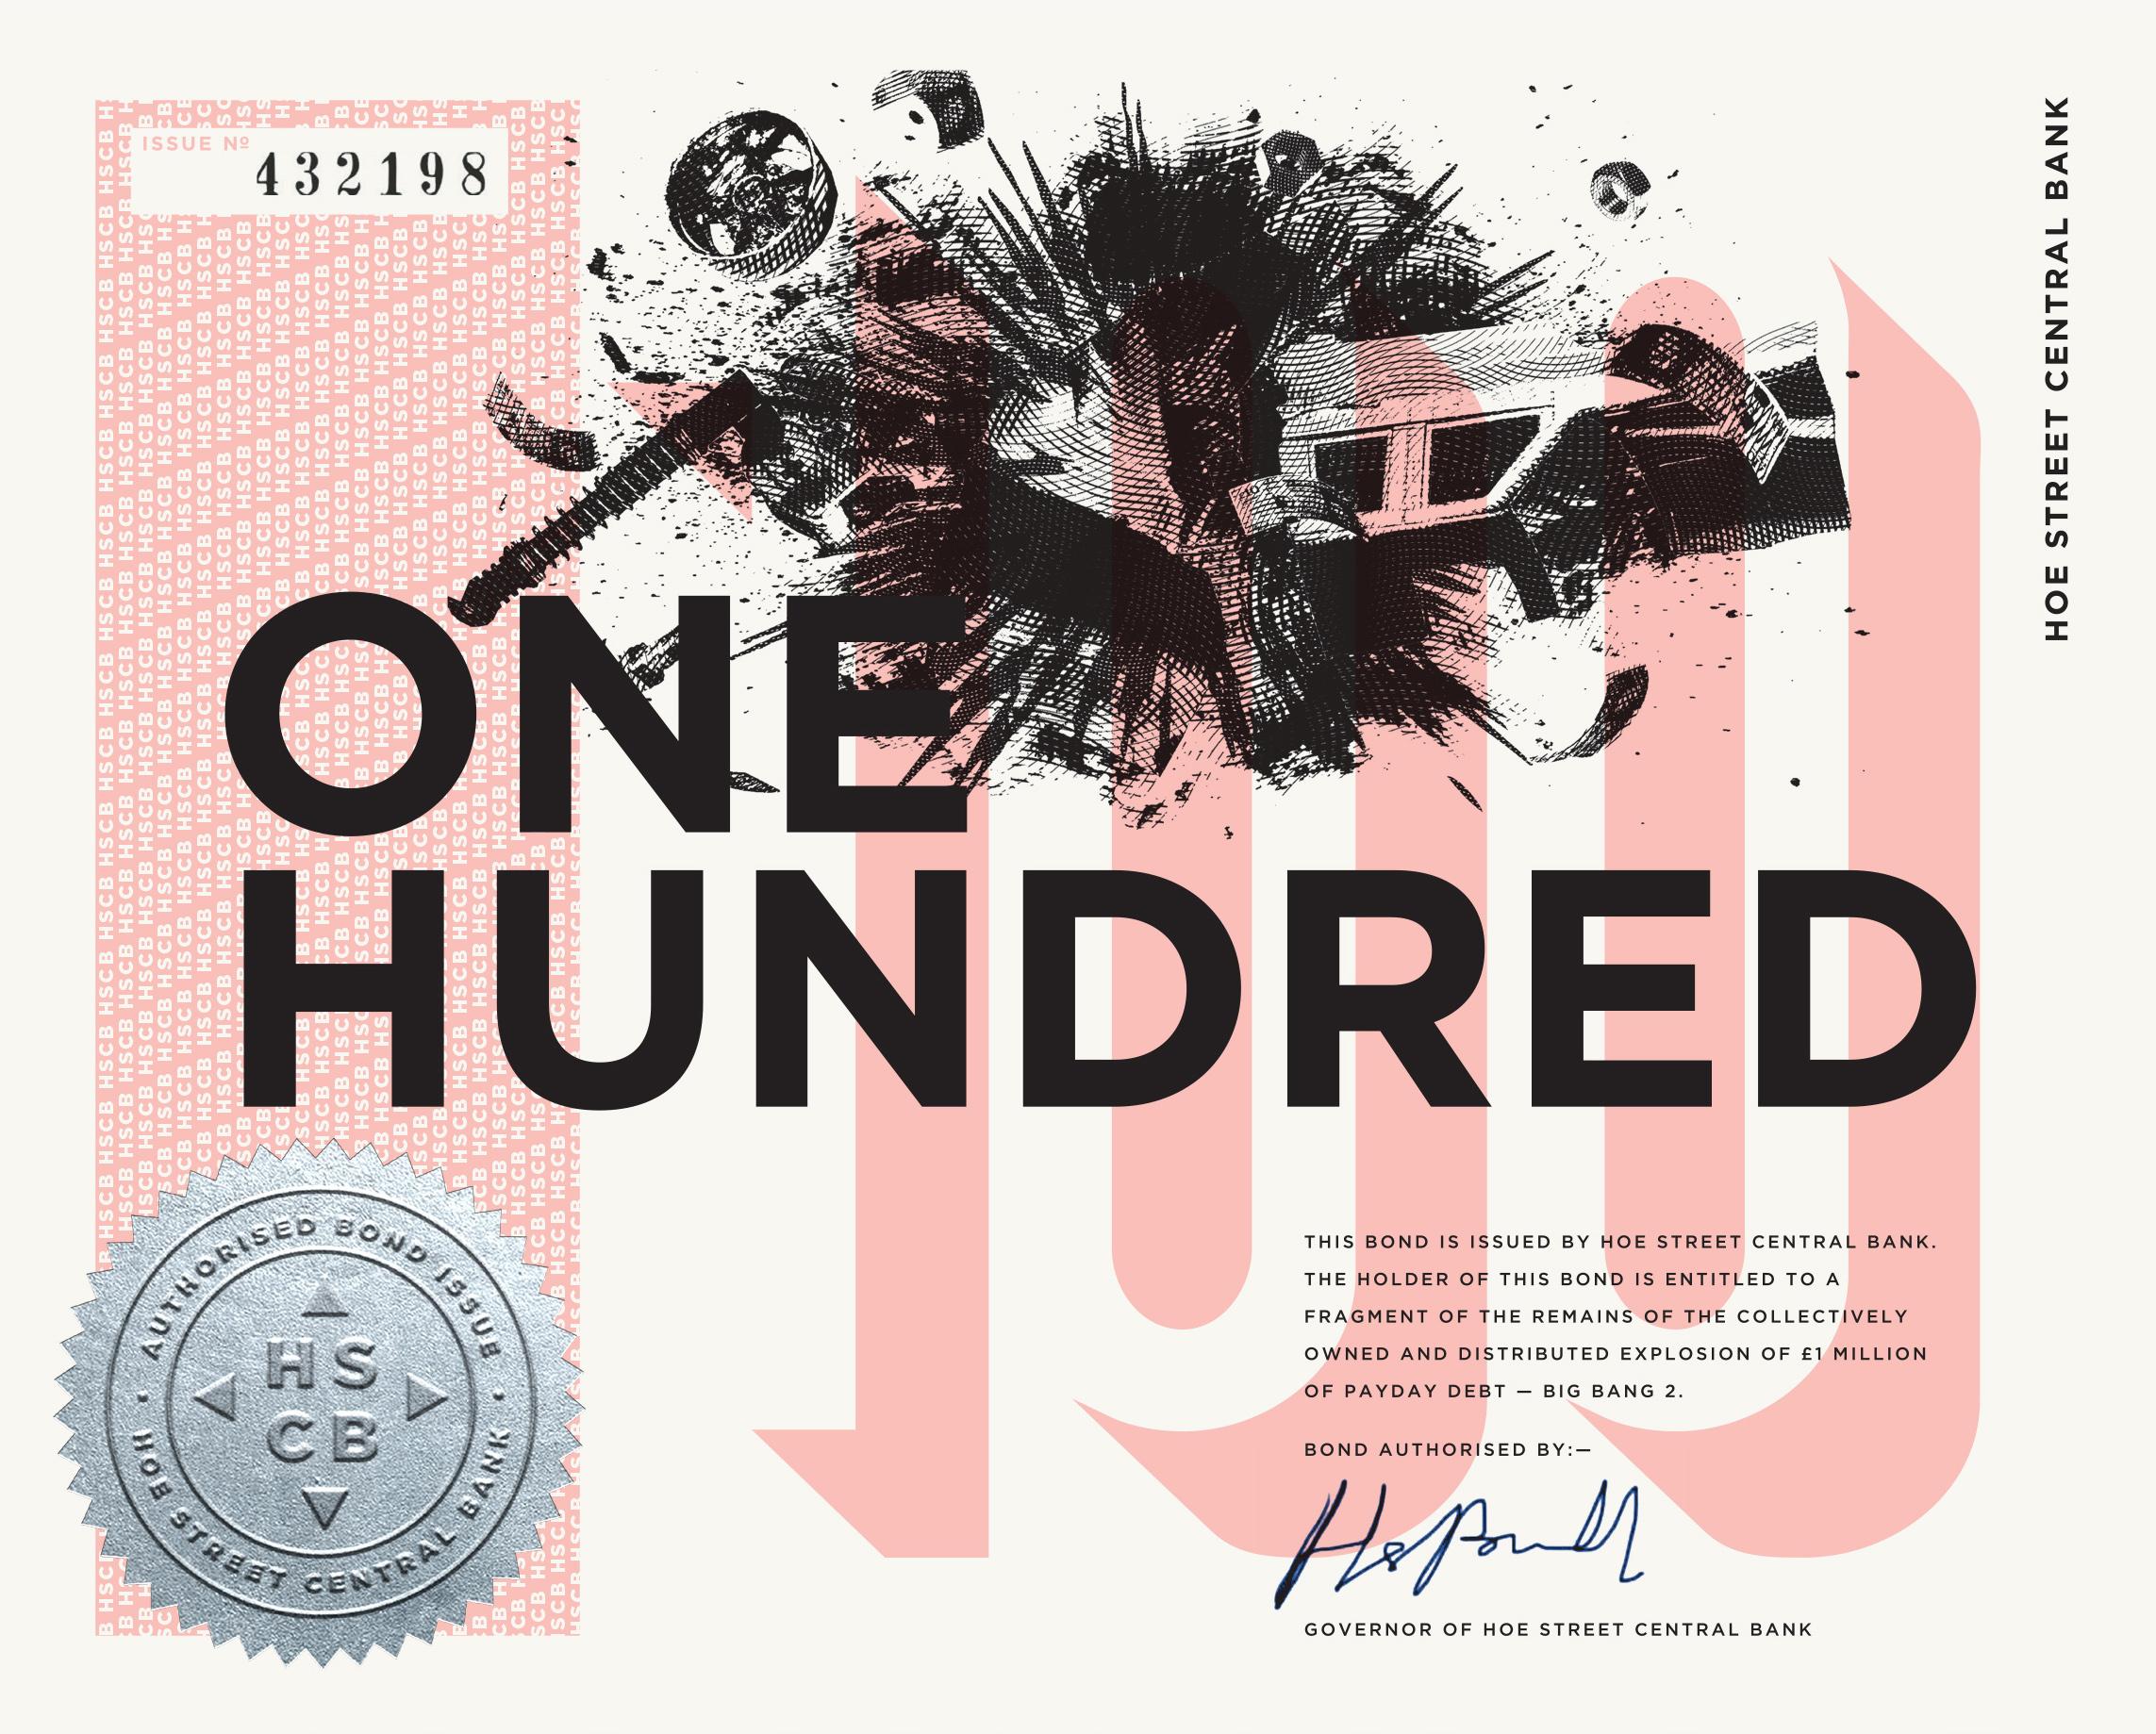 £100 HSCB BOND. Violet. 195X156mm. Screen print, letterpress, foil block, company seal. Somerset velvet white 250gsm paper. Gilt edge.   BUY £100 BOND  . The above is a digital mockuo. Return: coin.